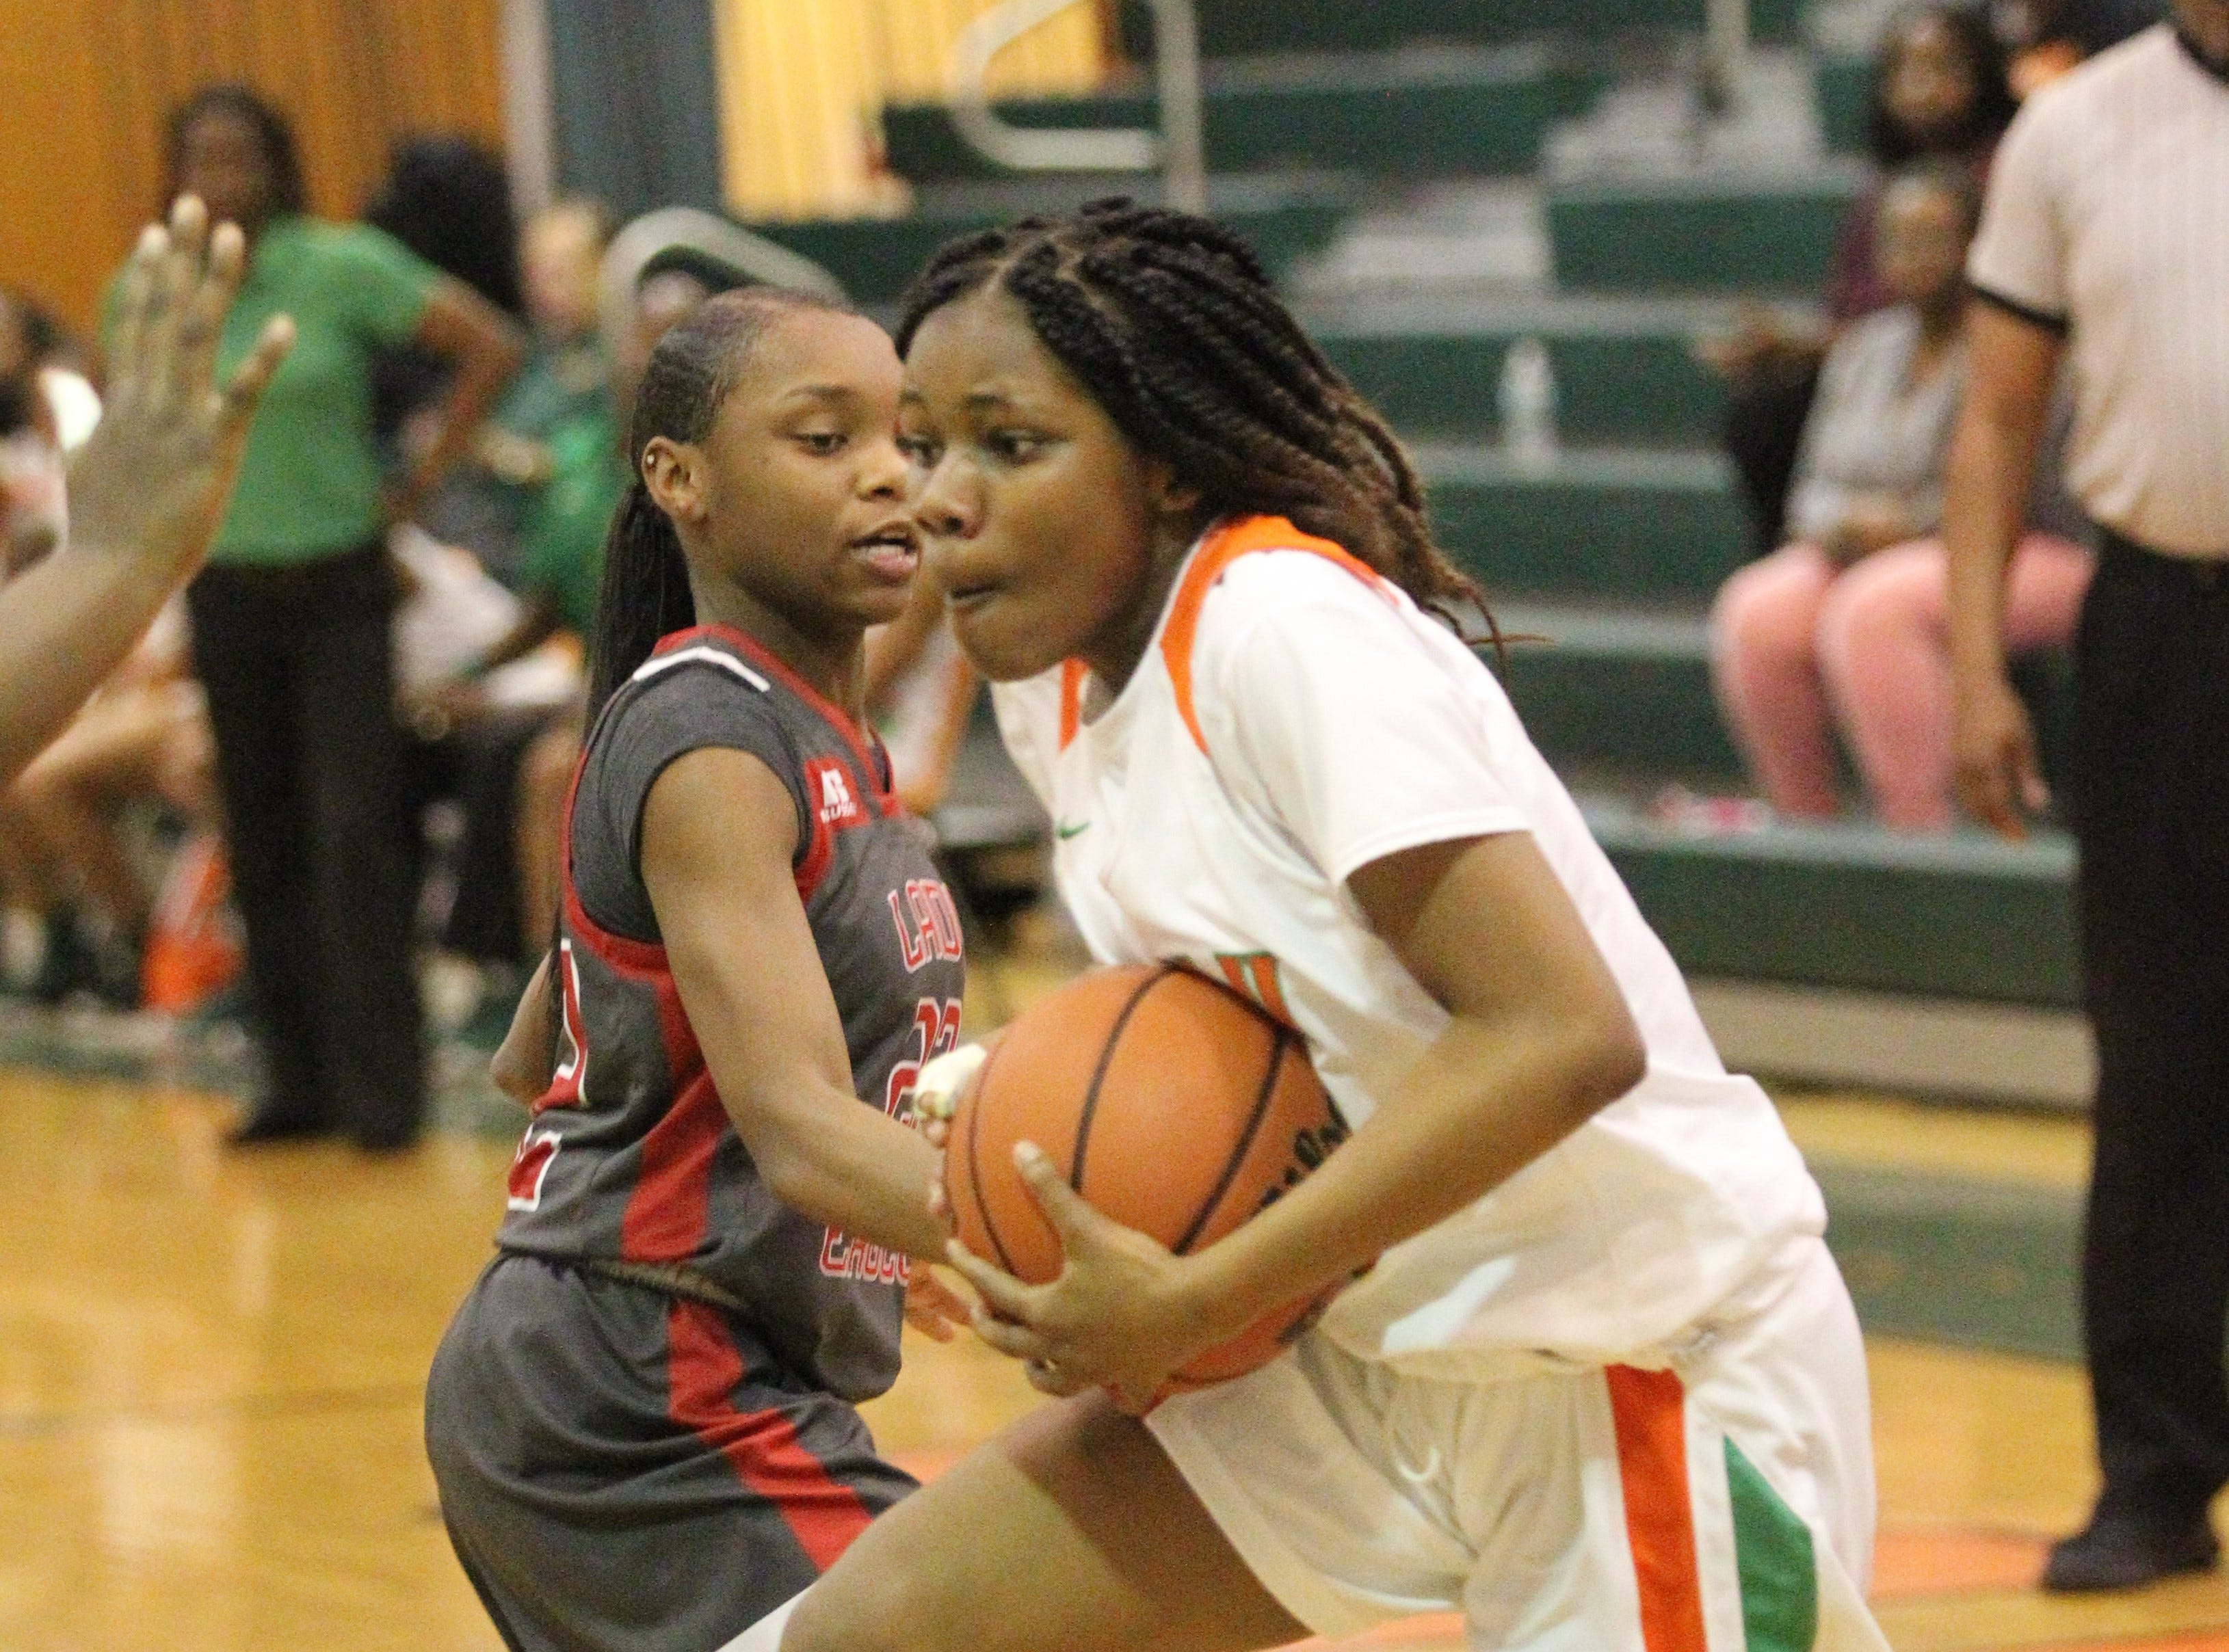 FAMU DRS freshman Alexandria Reddrick drives to the basket as FAMU DRS' girls basketball team beat NFC 59-41 for a District 1-3A title on Jan. 7, 2019.